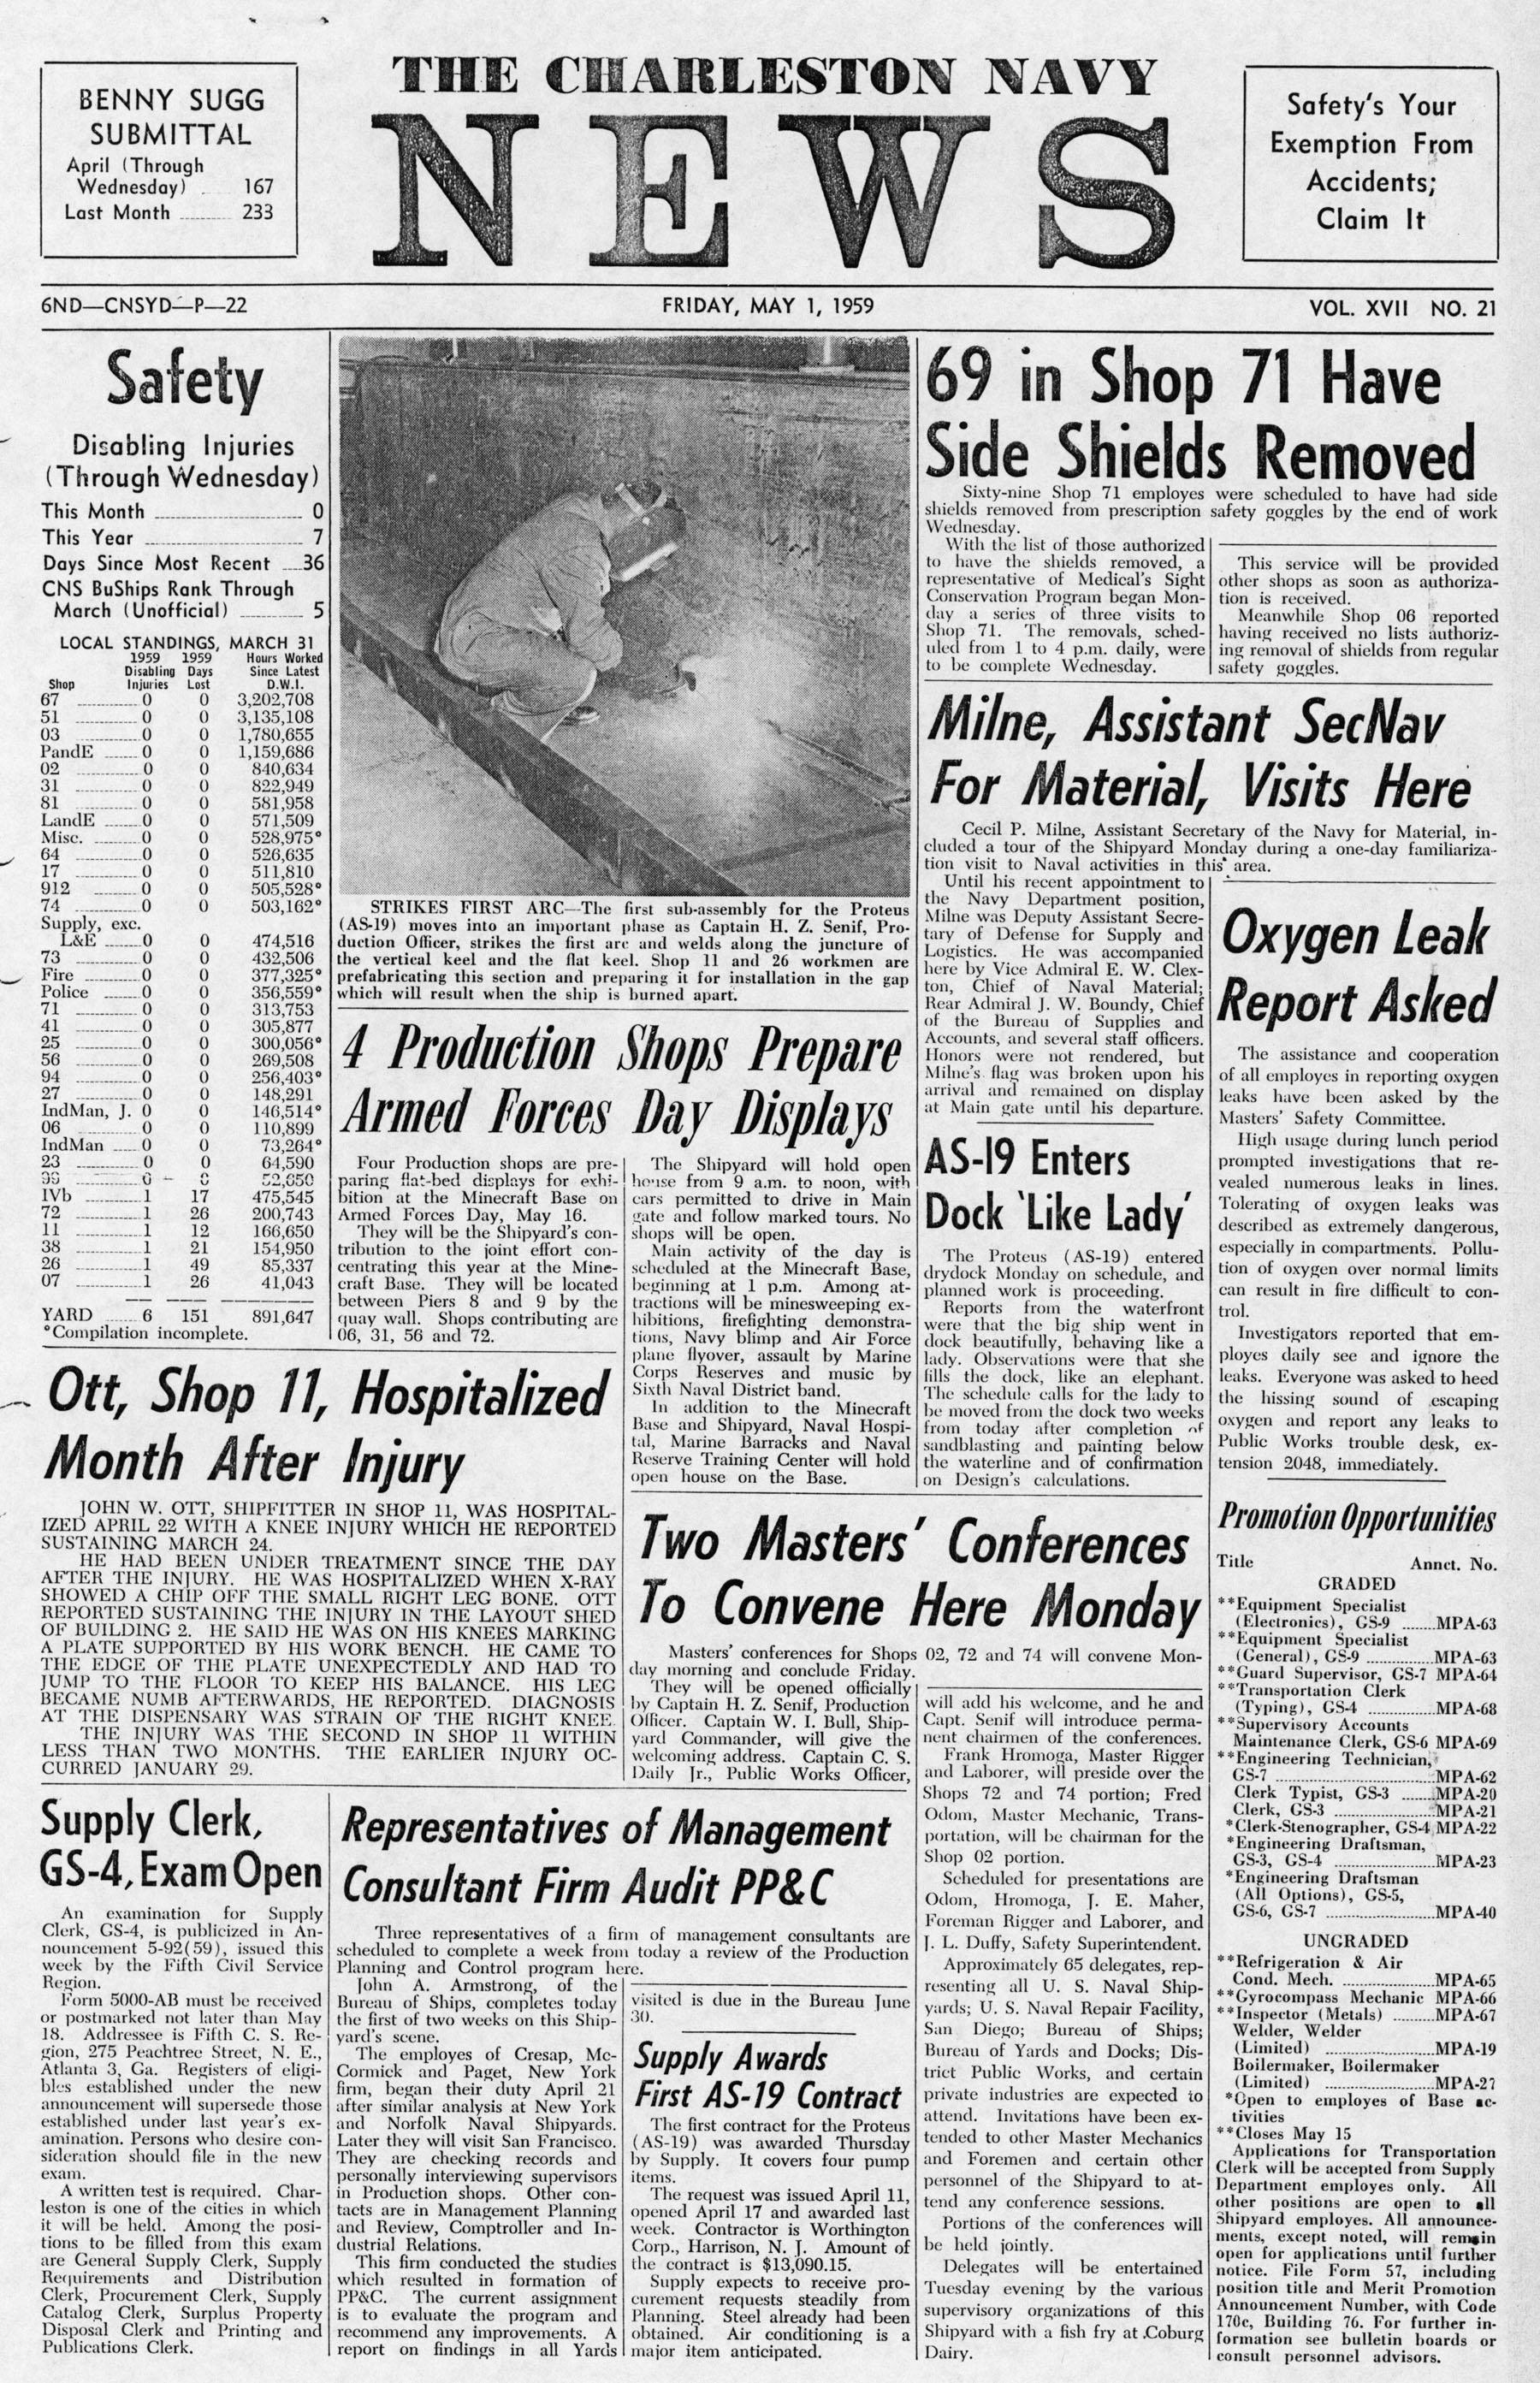 The Charleston Navy News, Volume 17, Edition 21, page i